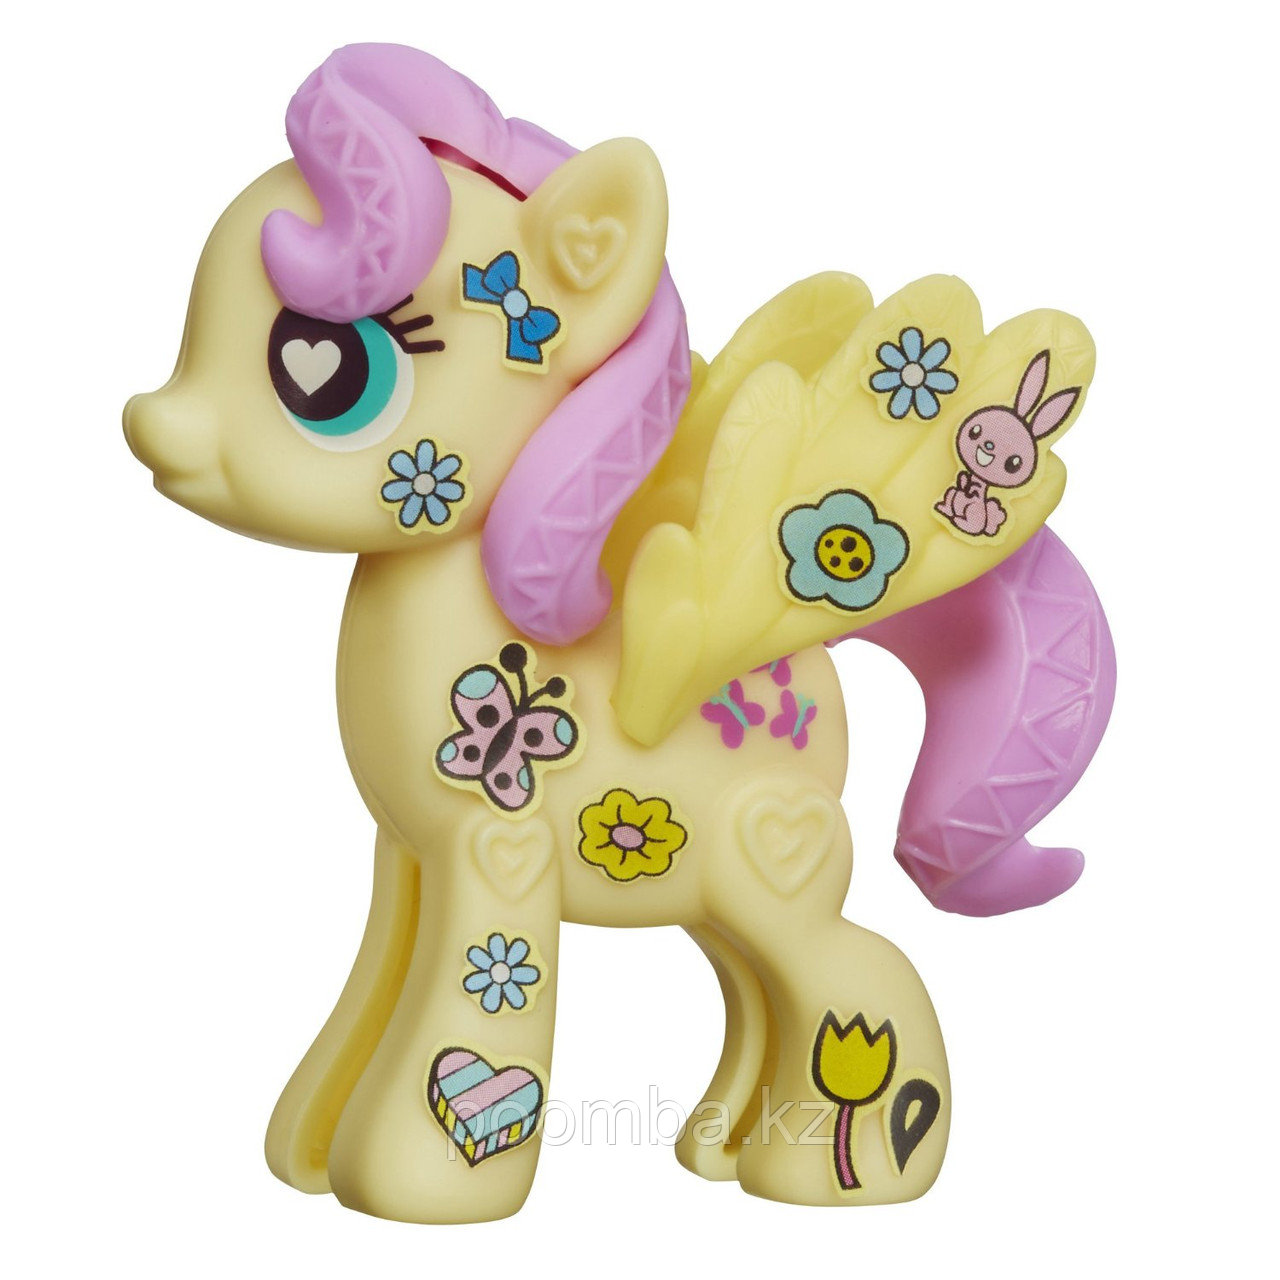 "Поп-конструктор My Little Pony ""Создай свою пони"" - Флаттершай"